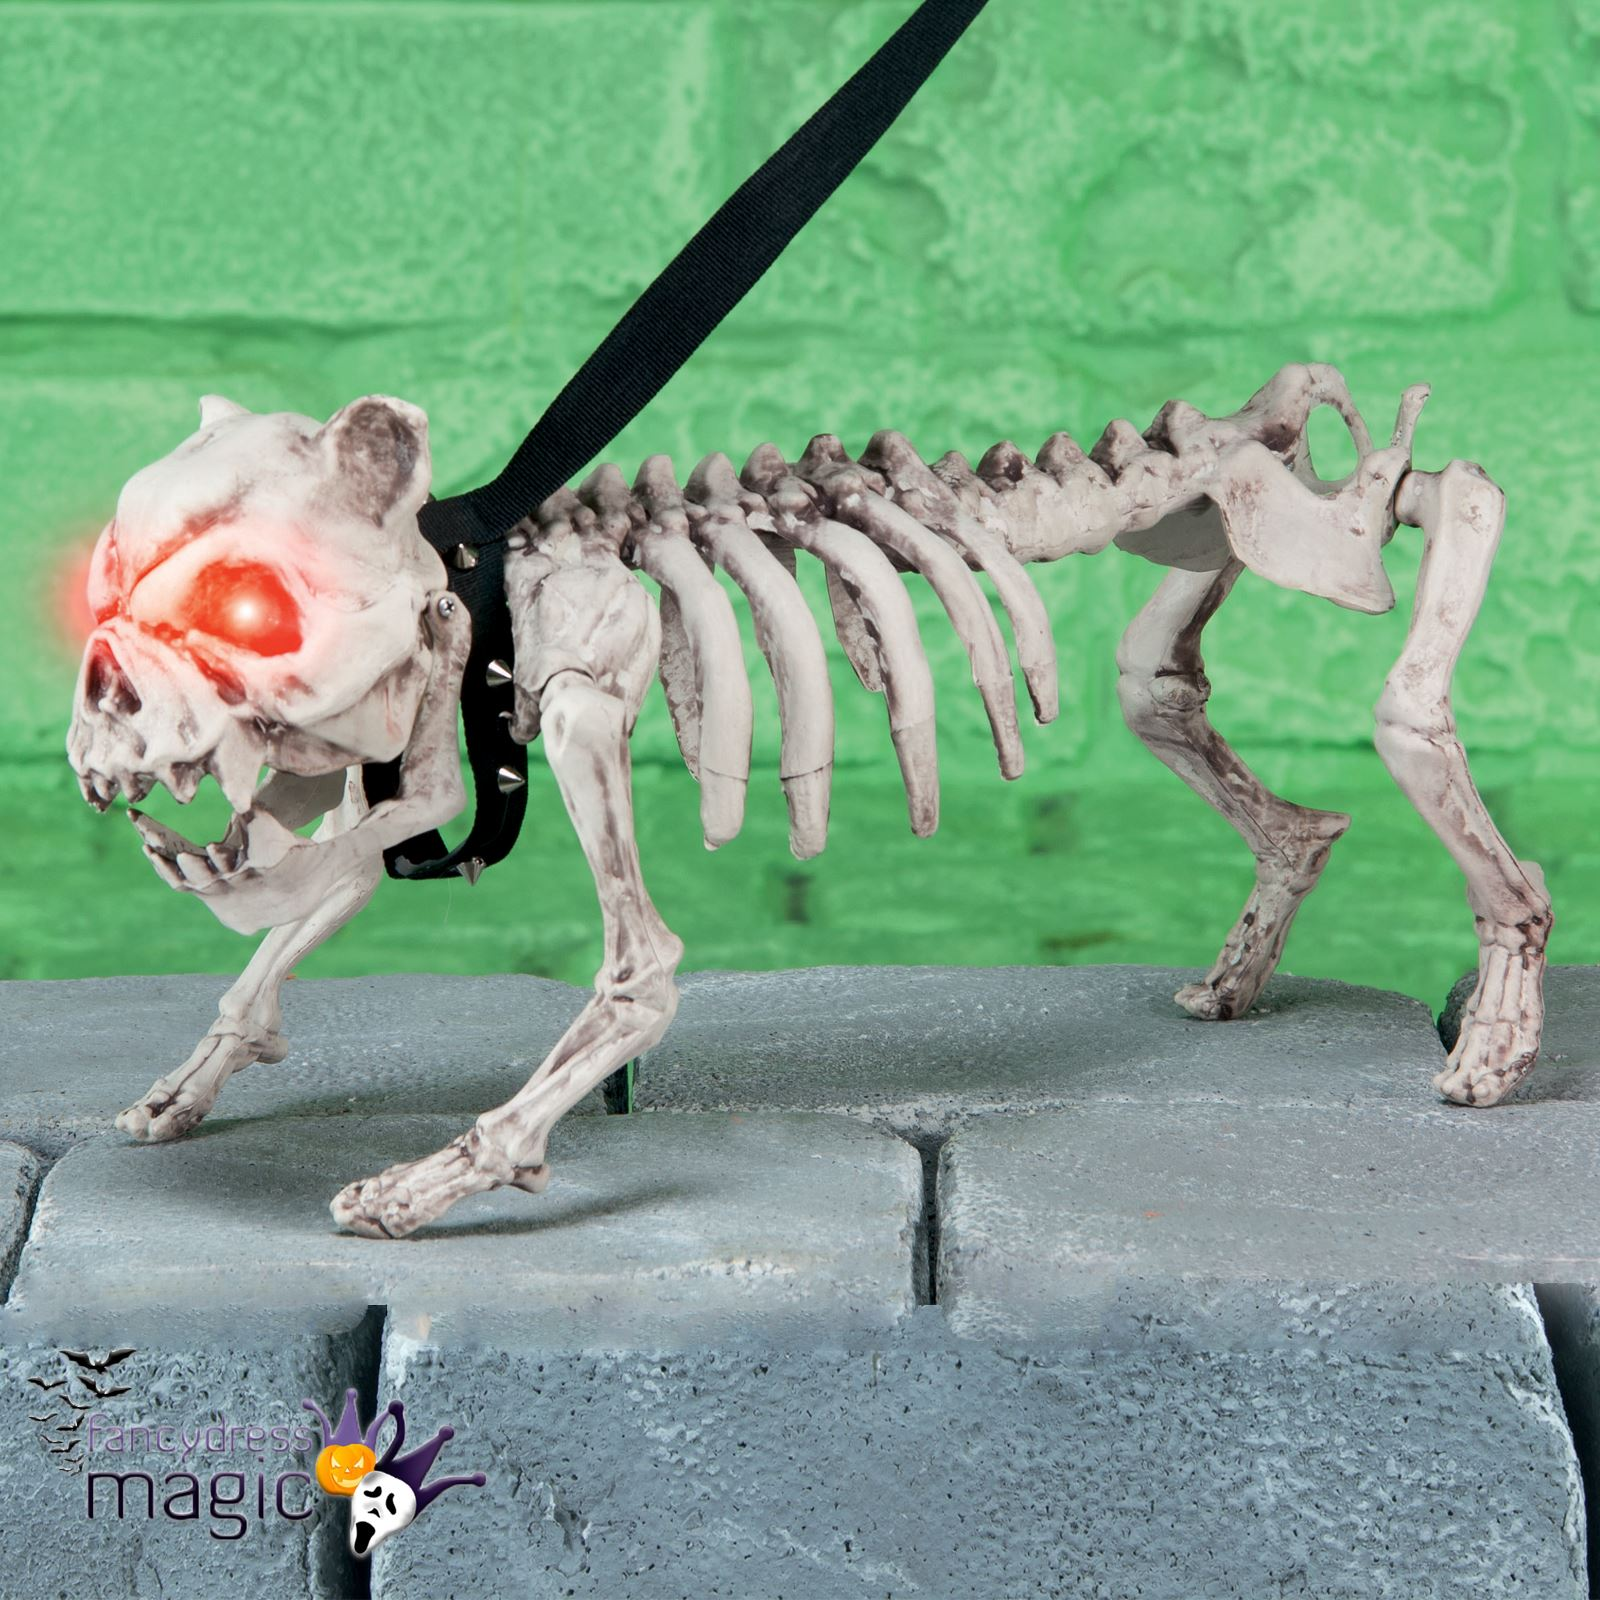 barking standing skeleton ghost dog with light up eyes halloween decoration prop